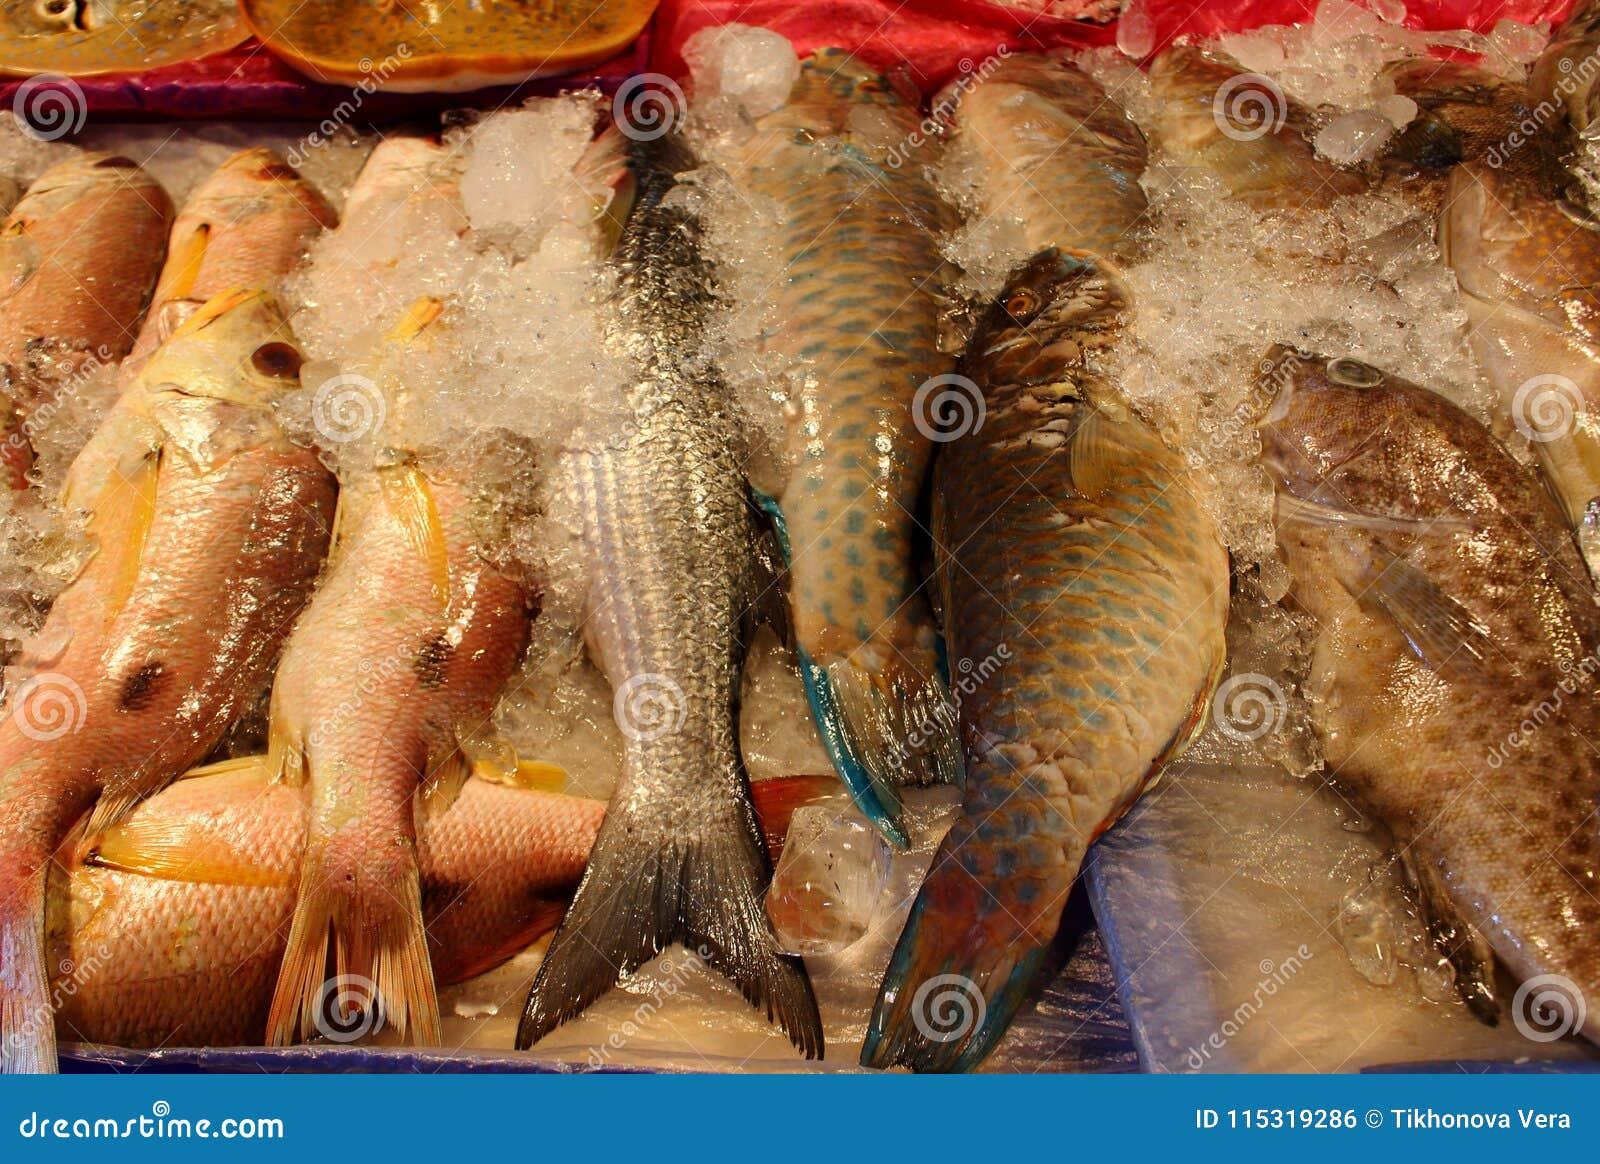 Pile of fresh sea fish on market